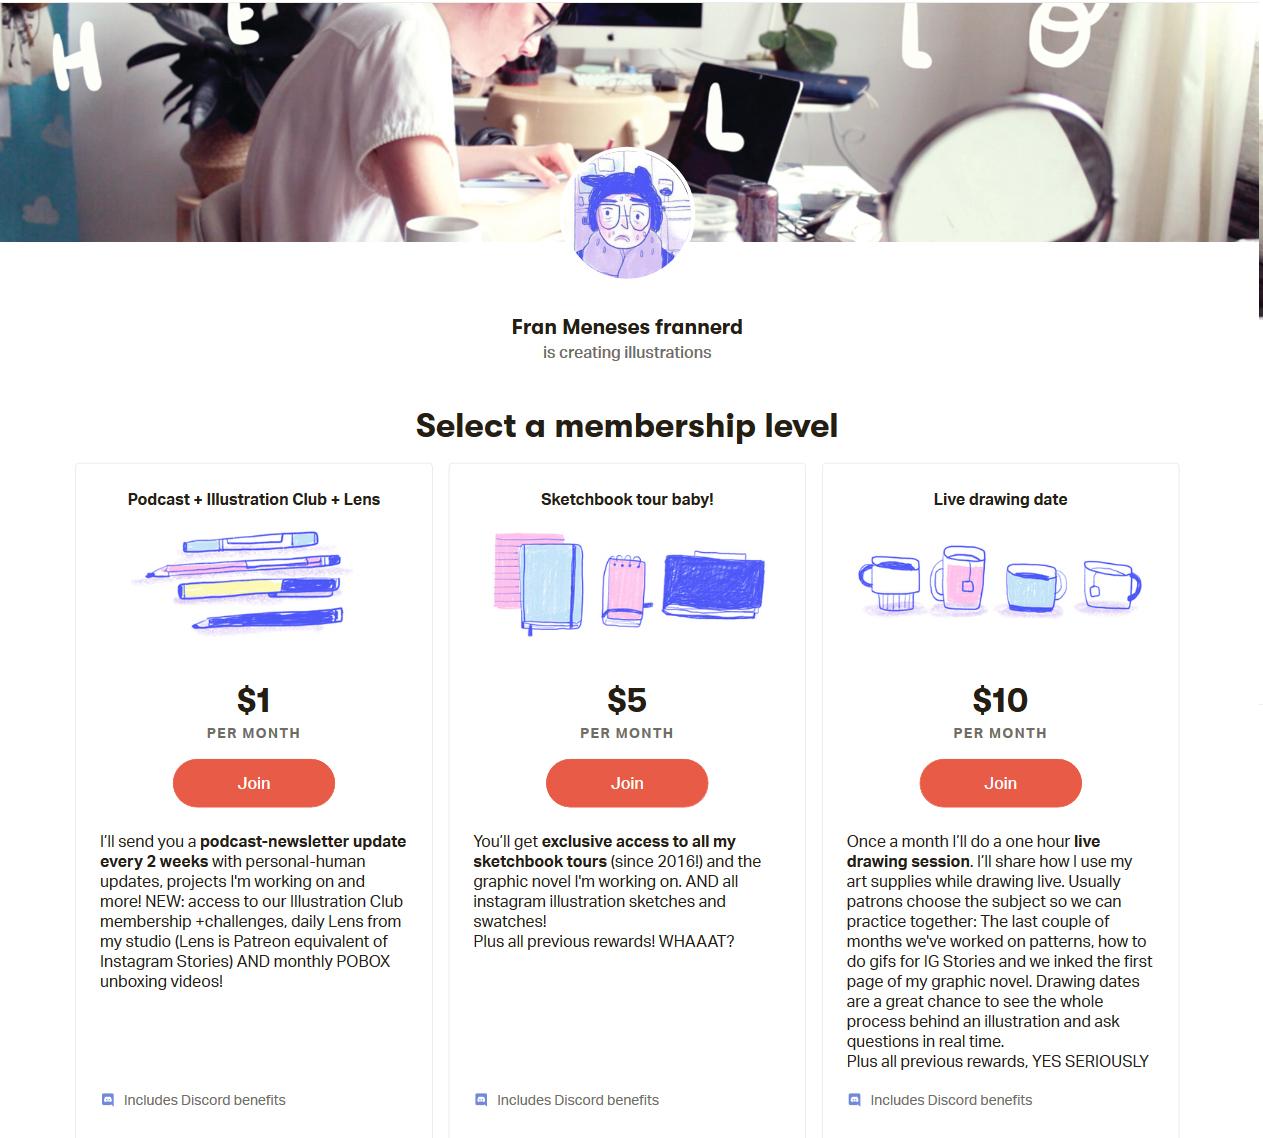 Клон Сайта Kickstarter Страница Fran Meneses